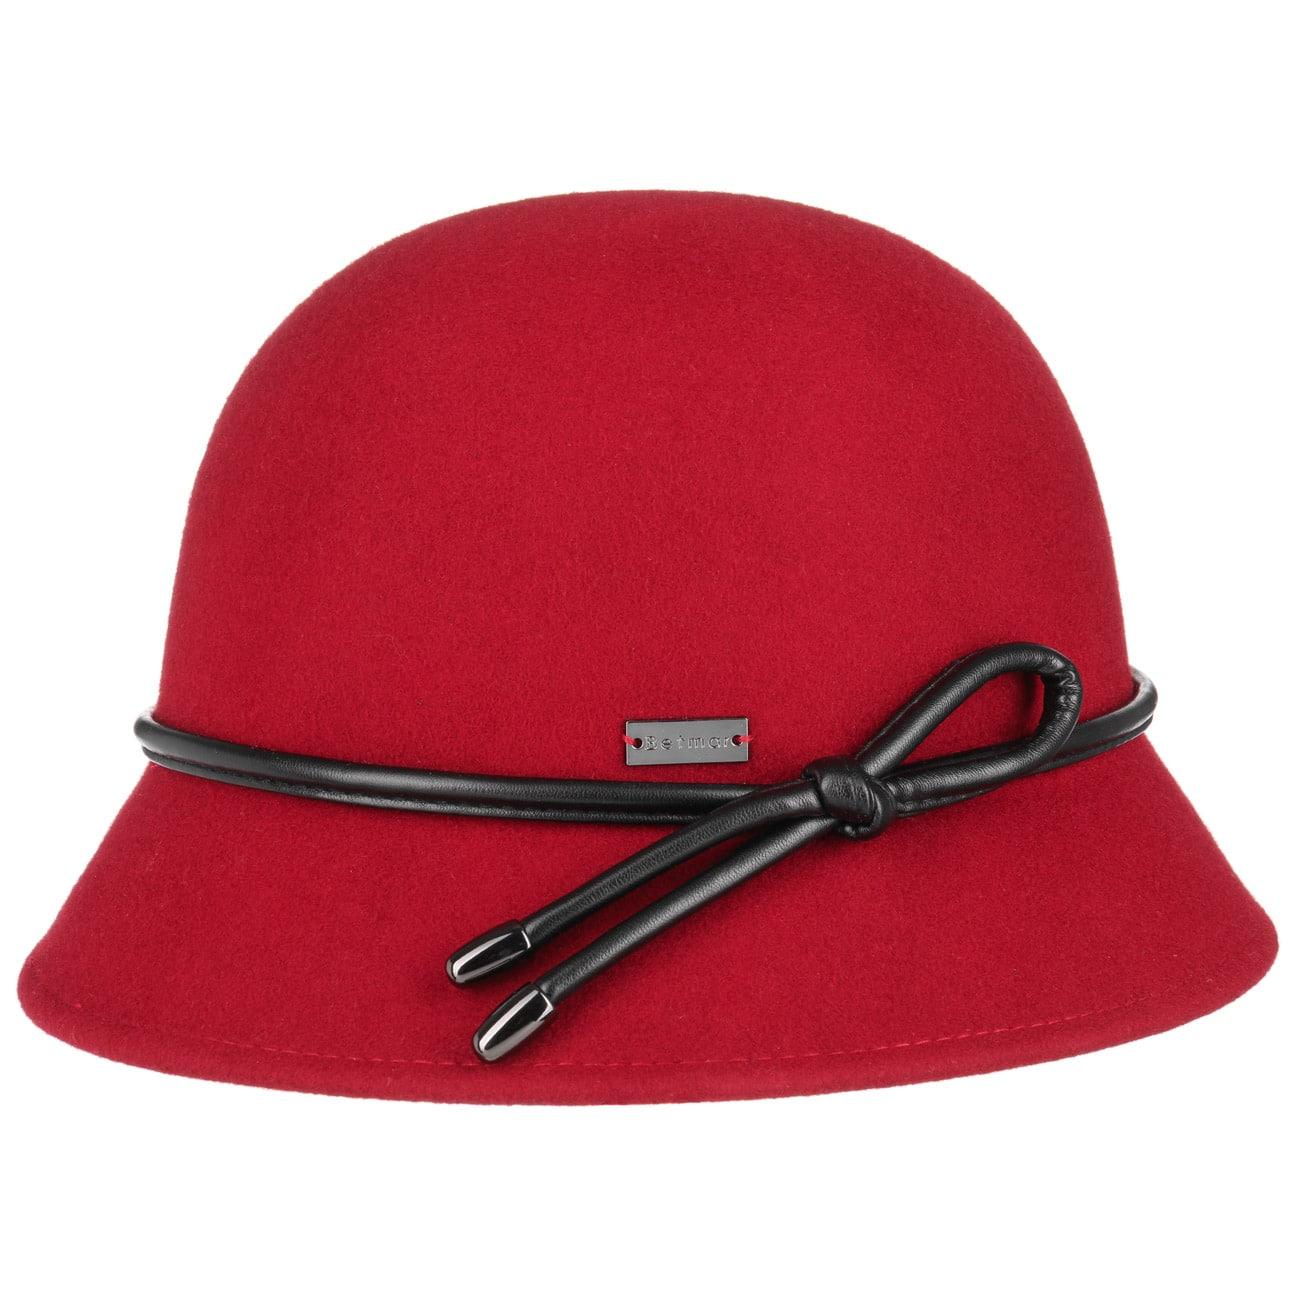 Sombrero Cloch? Christina by Betmar  sombrero cloch